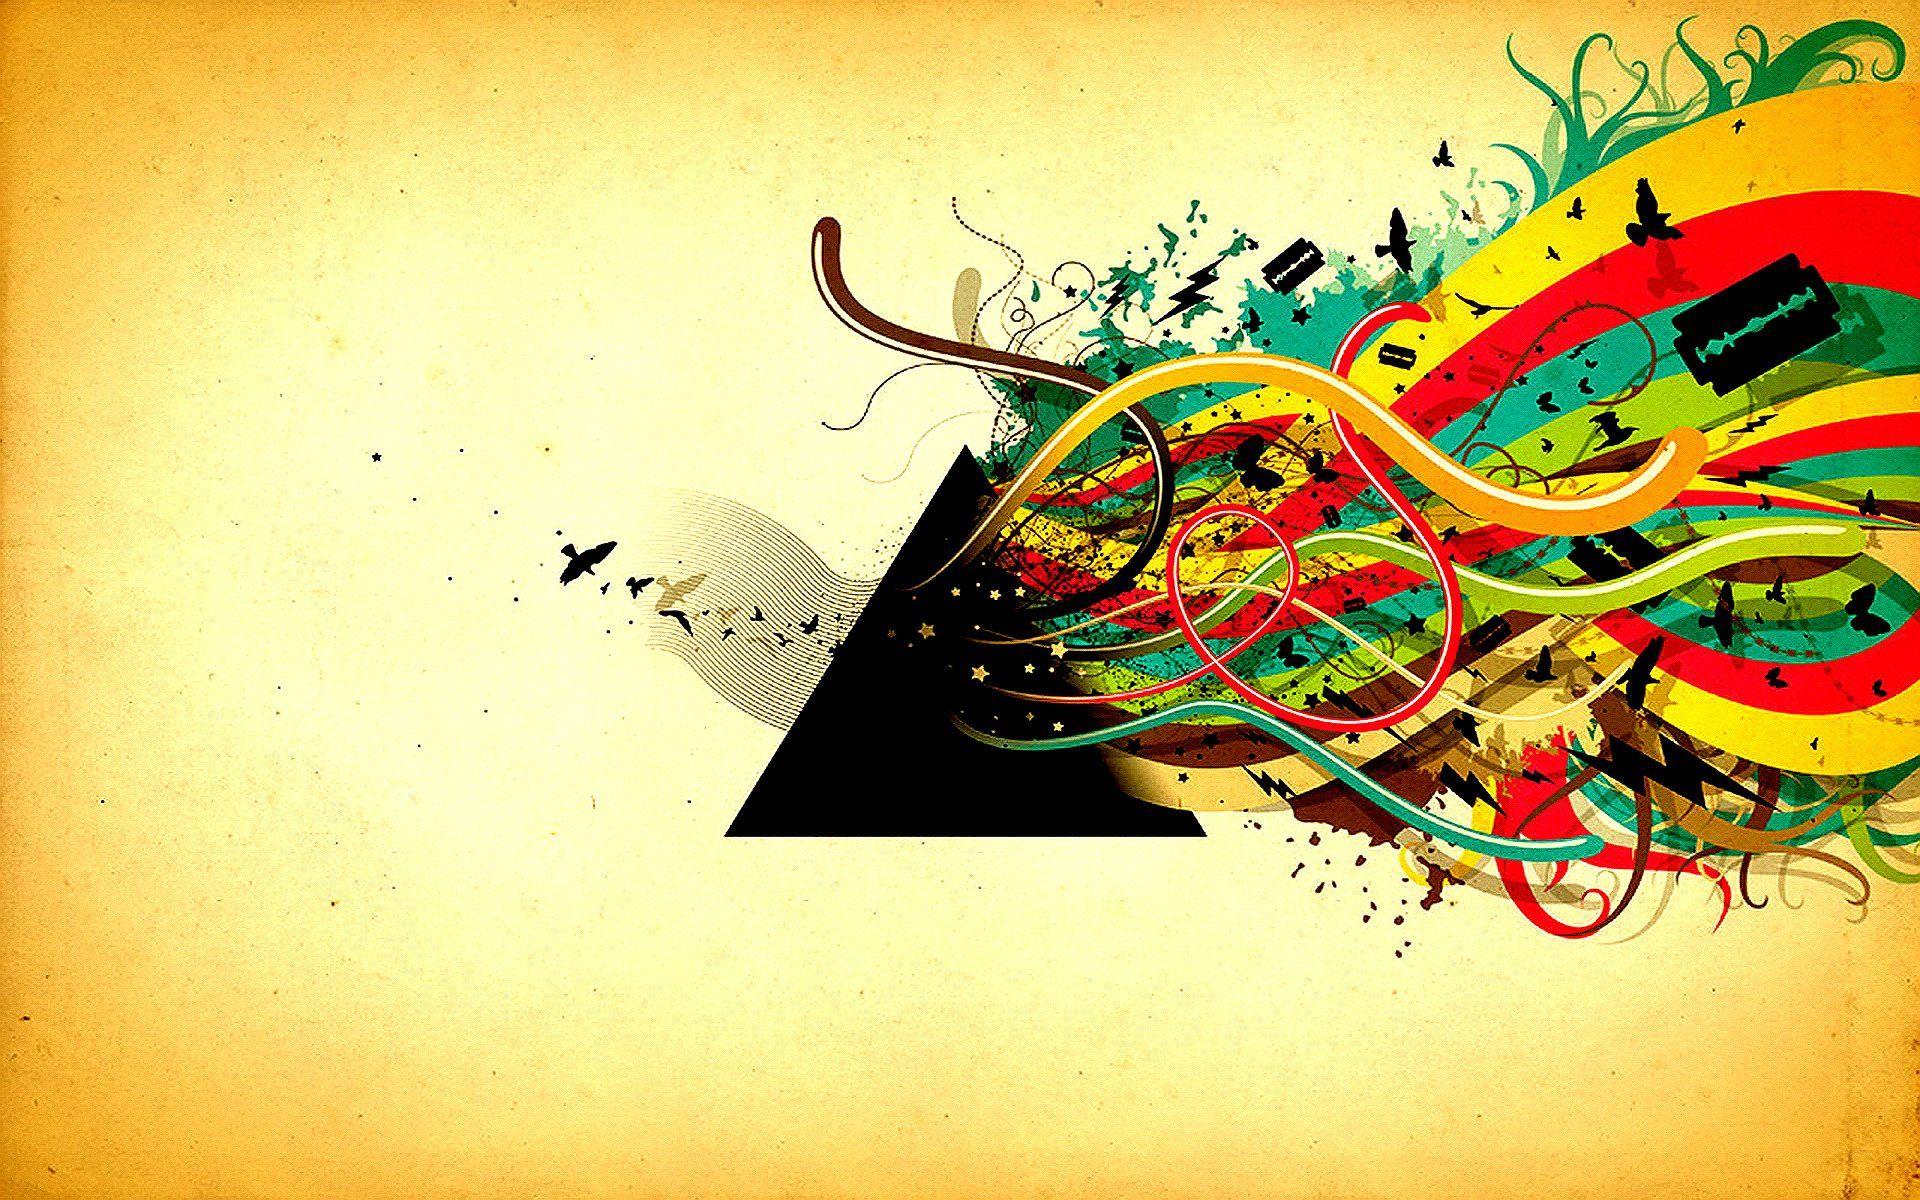 PINK FLOYD progressive rock psychedelic classic hard wallpaper 1920x1200